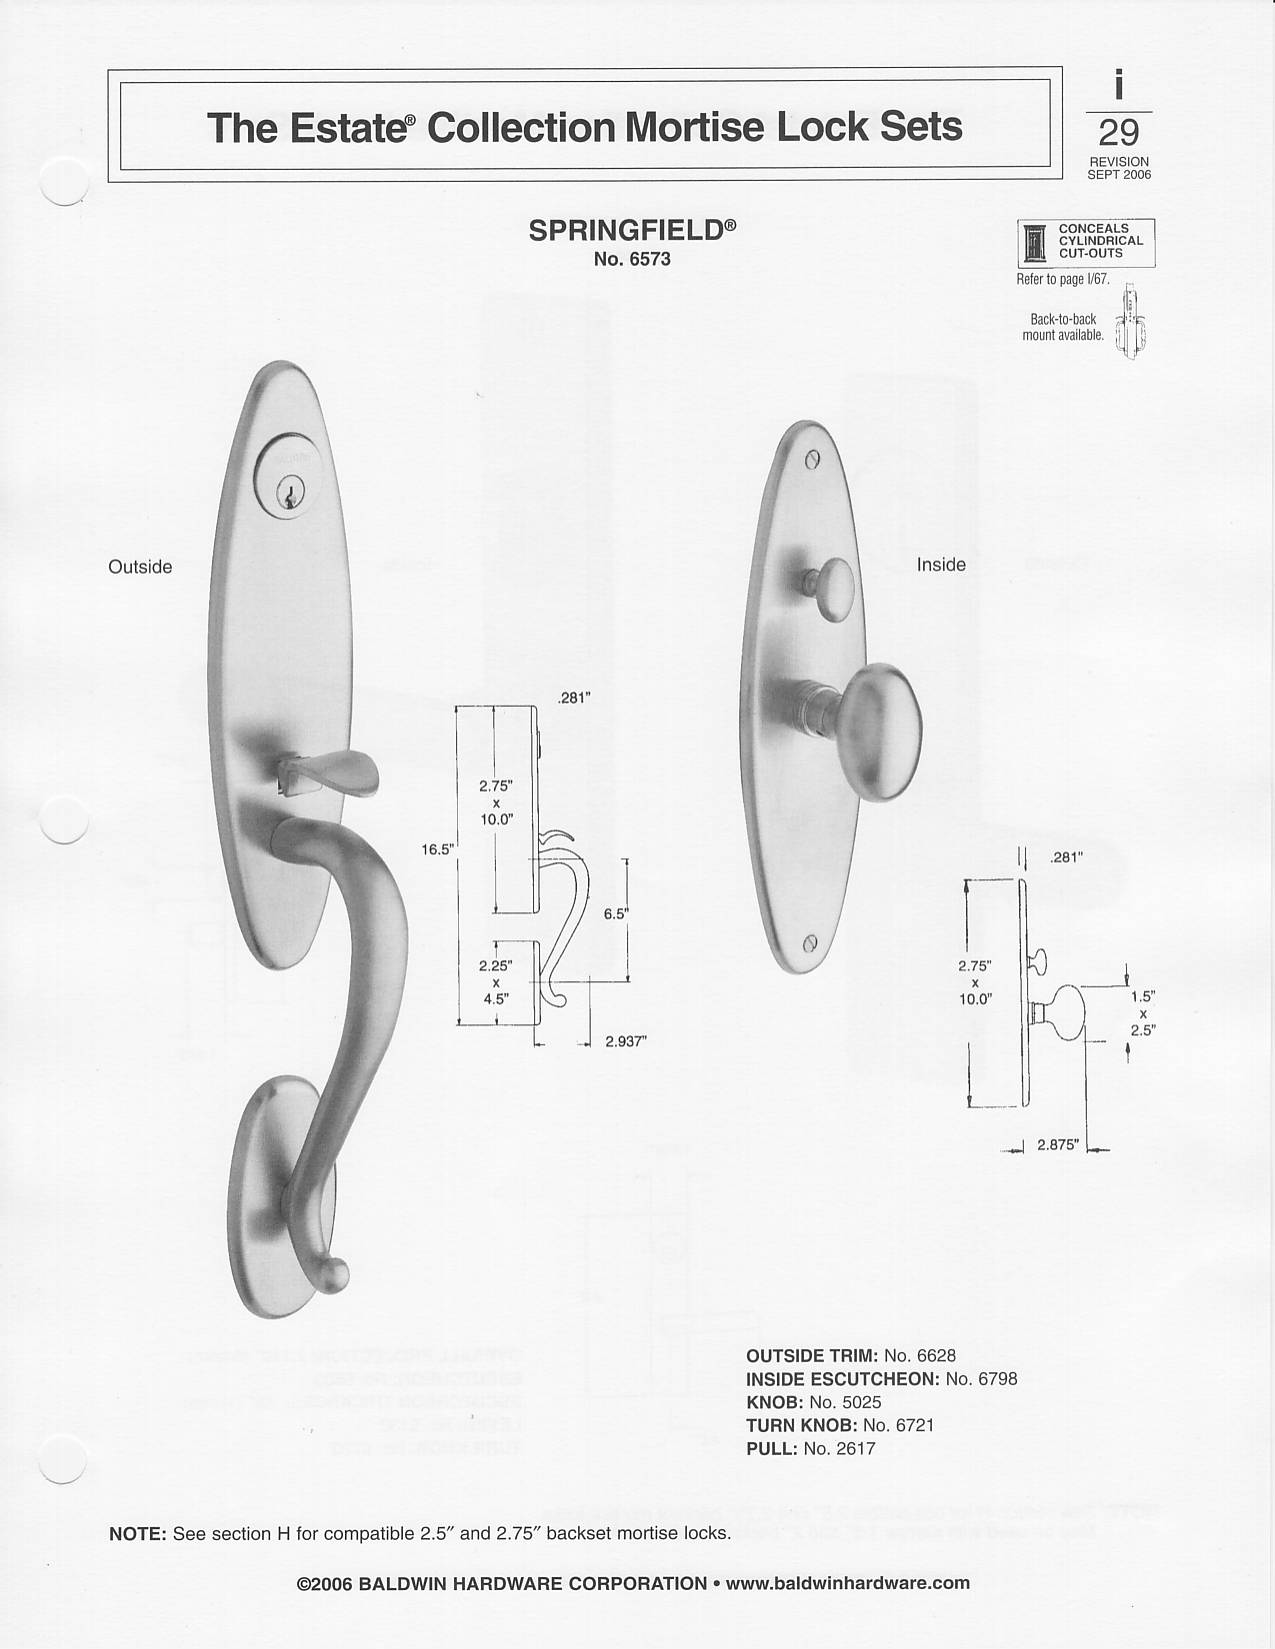 mortise lock parts diagram pioneer avic n2 cpn1955 wiring baldwin colonial style solid brass handle set springfield